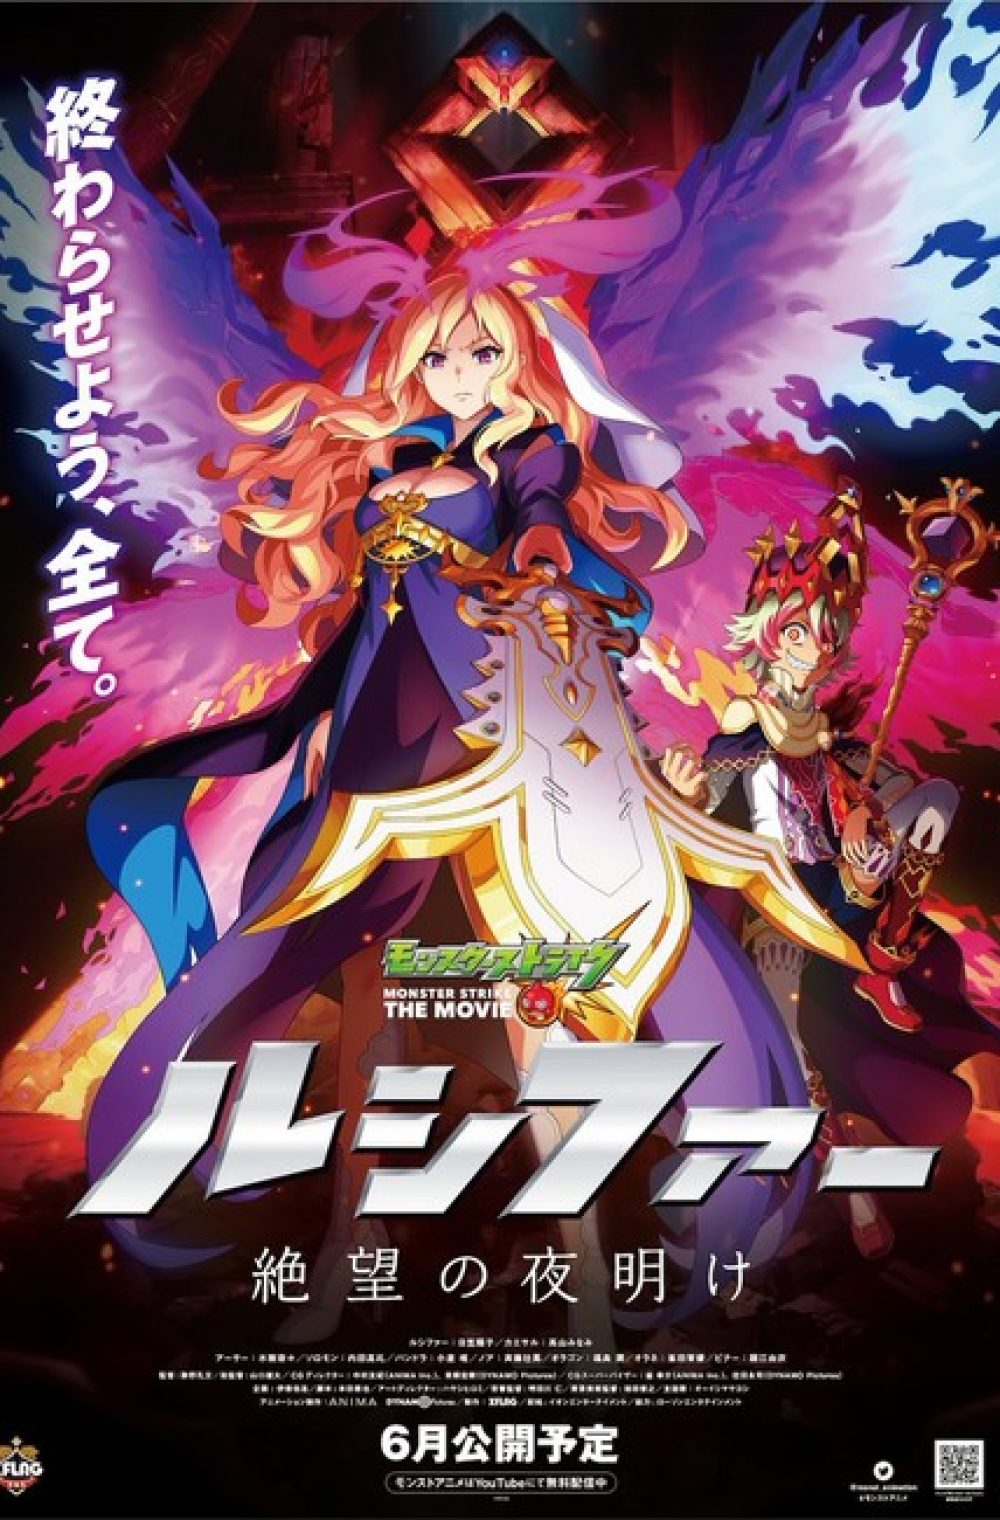 Monster Strike the Movie: Lucifer – Zetsubou no Yoake